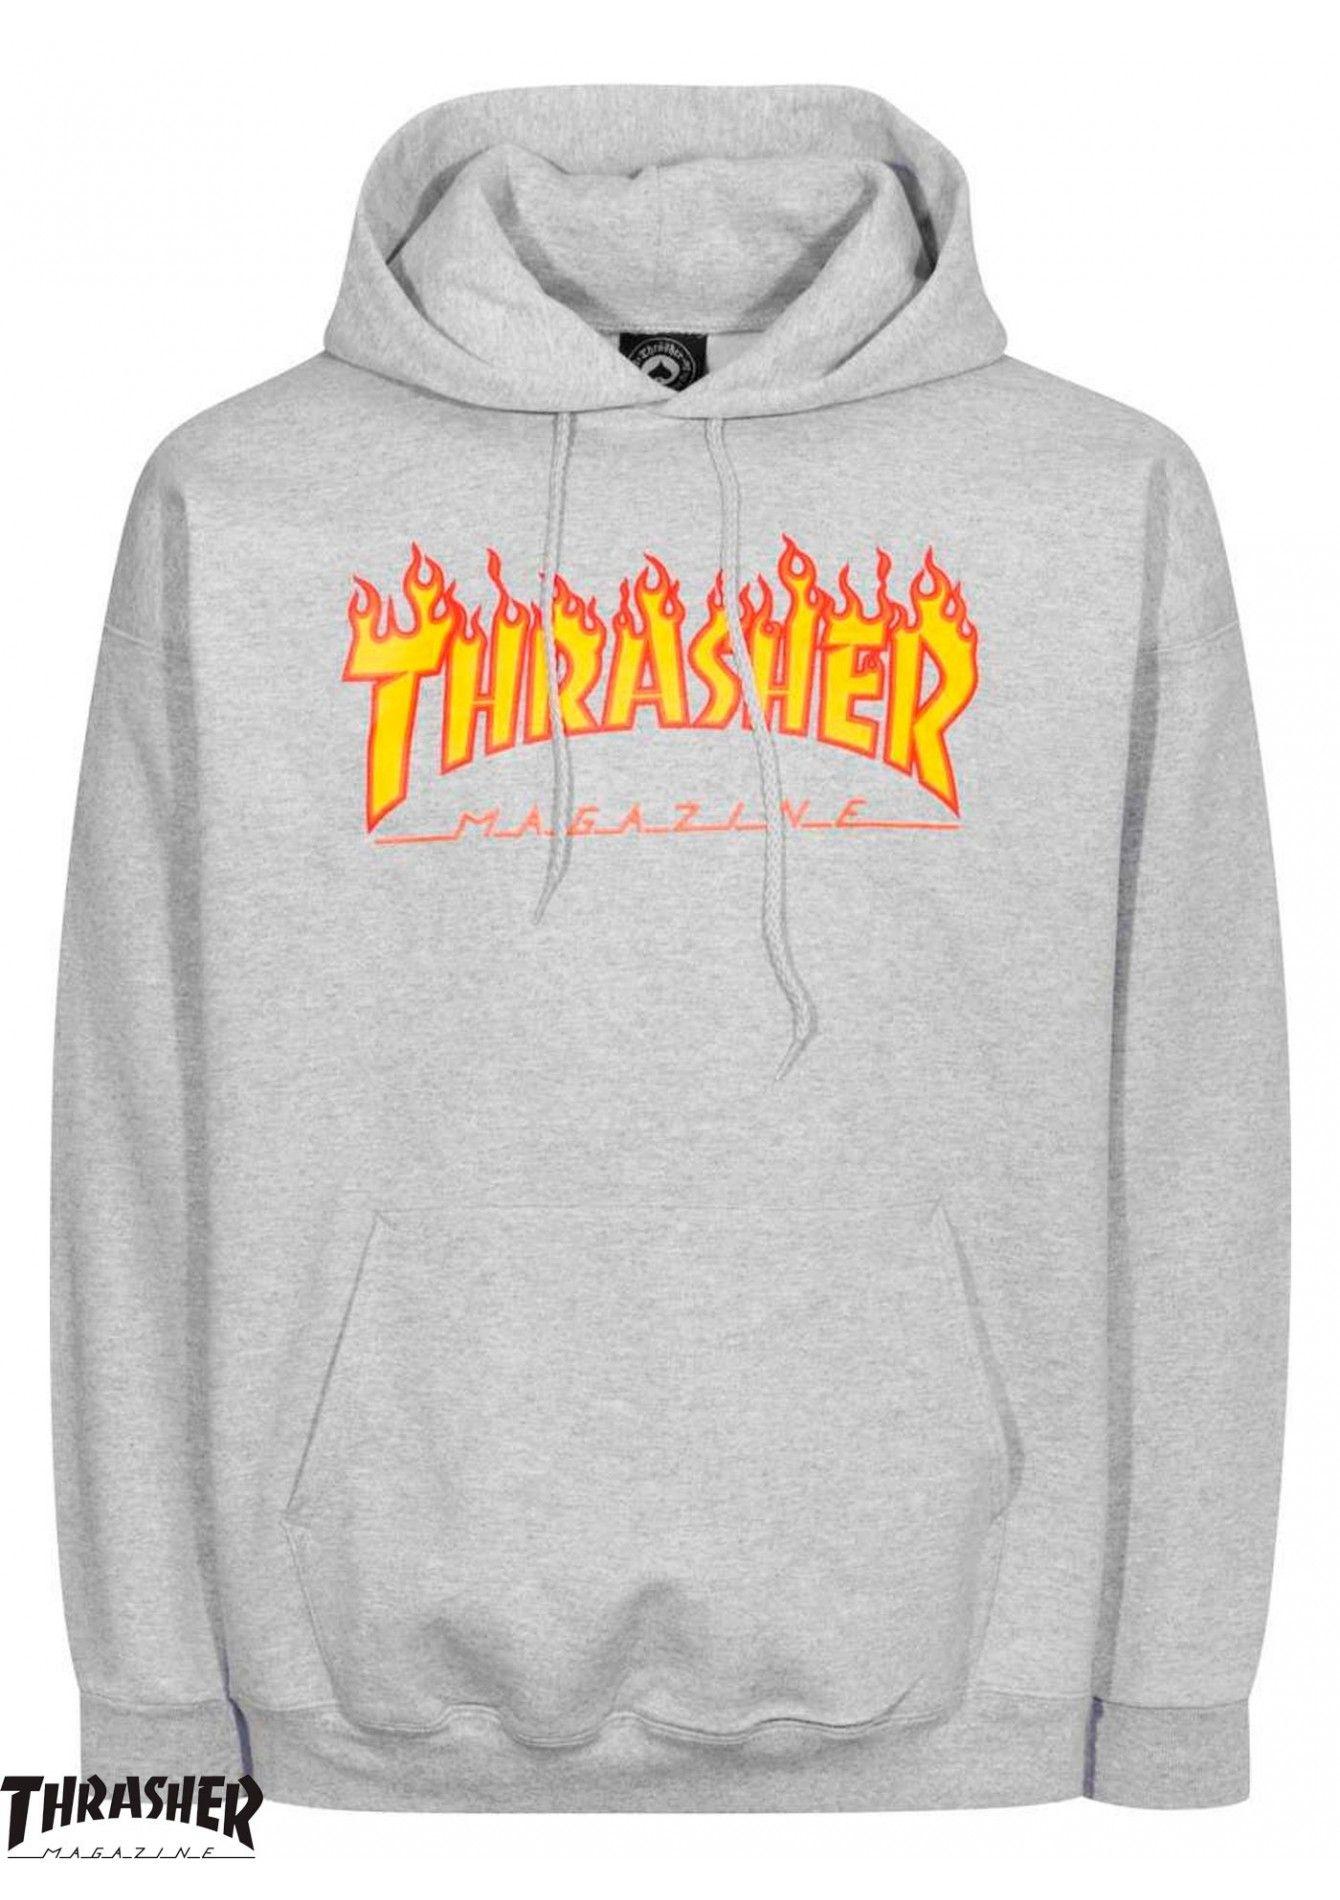 Trasher Flame Logo Cinza Fire Hoodie Thrasher Sweatshirt Hoody Outfits [ 1900 x 1340 Pixel ]